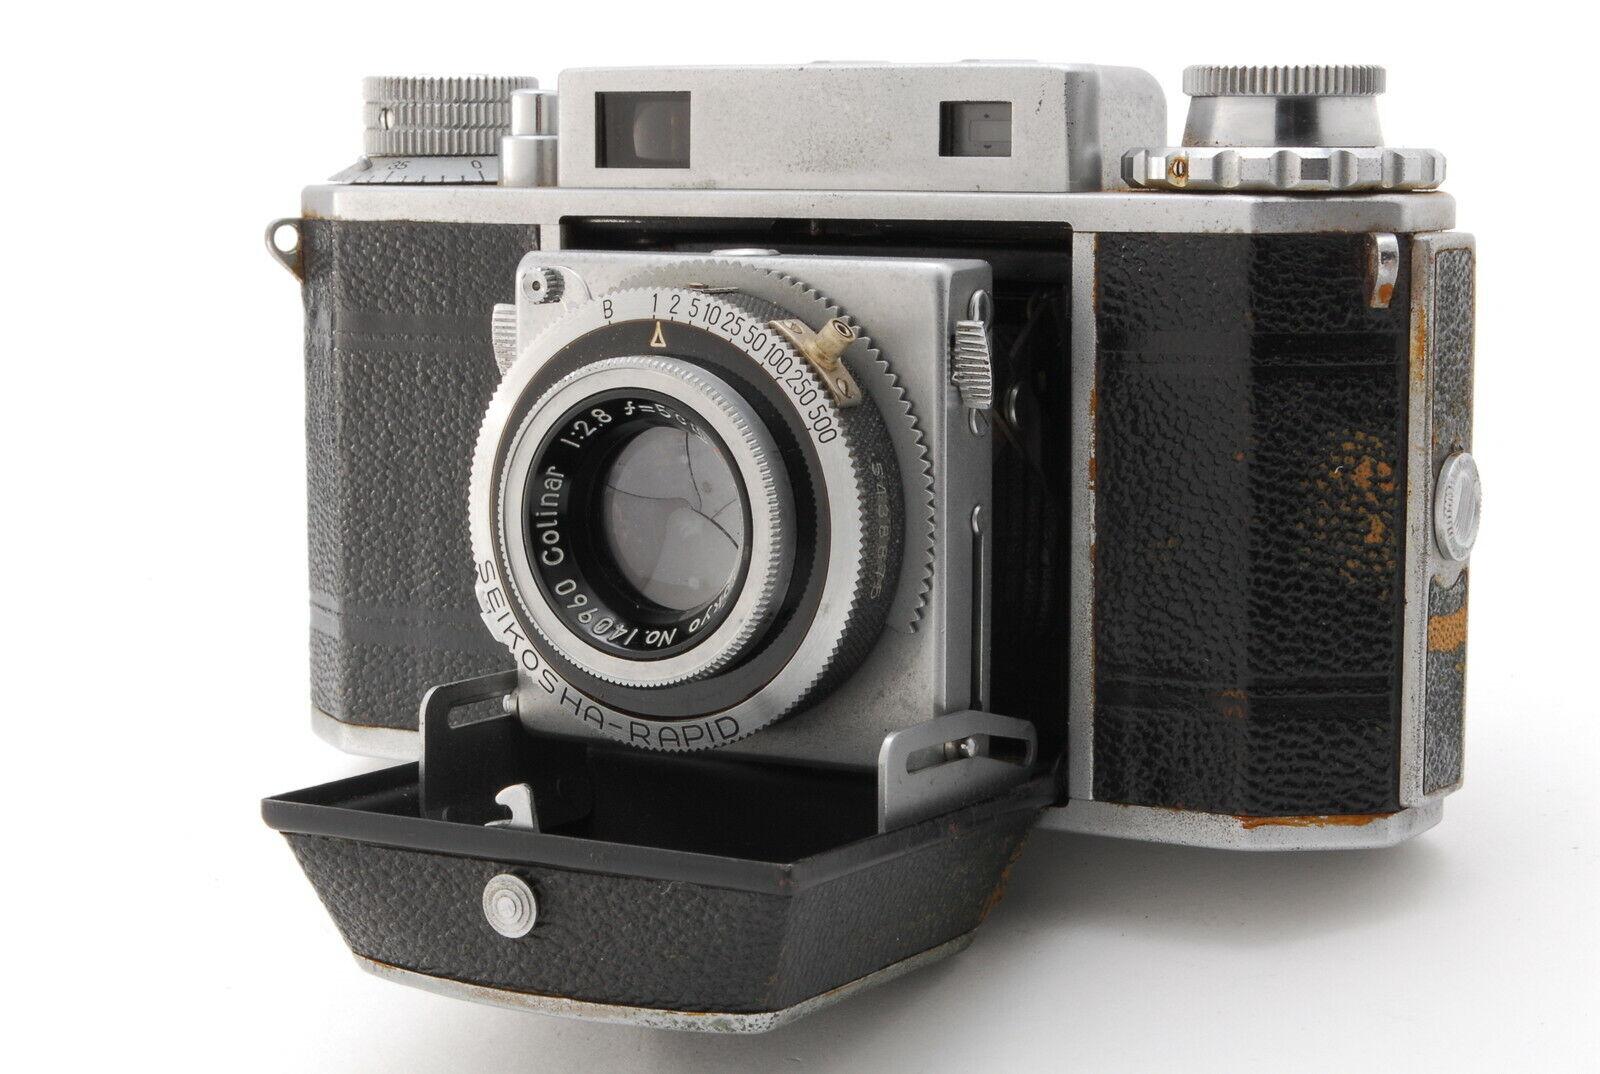 [AS-IS]ARCO 35 Rangefinder Film Vintage Camera Body From Japan